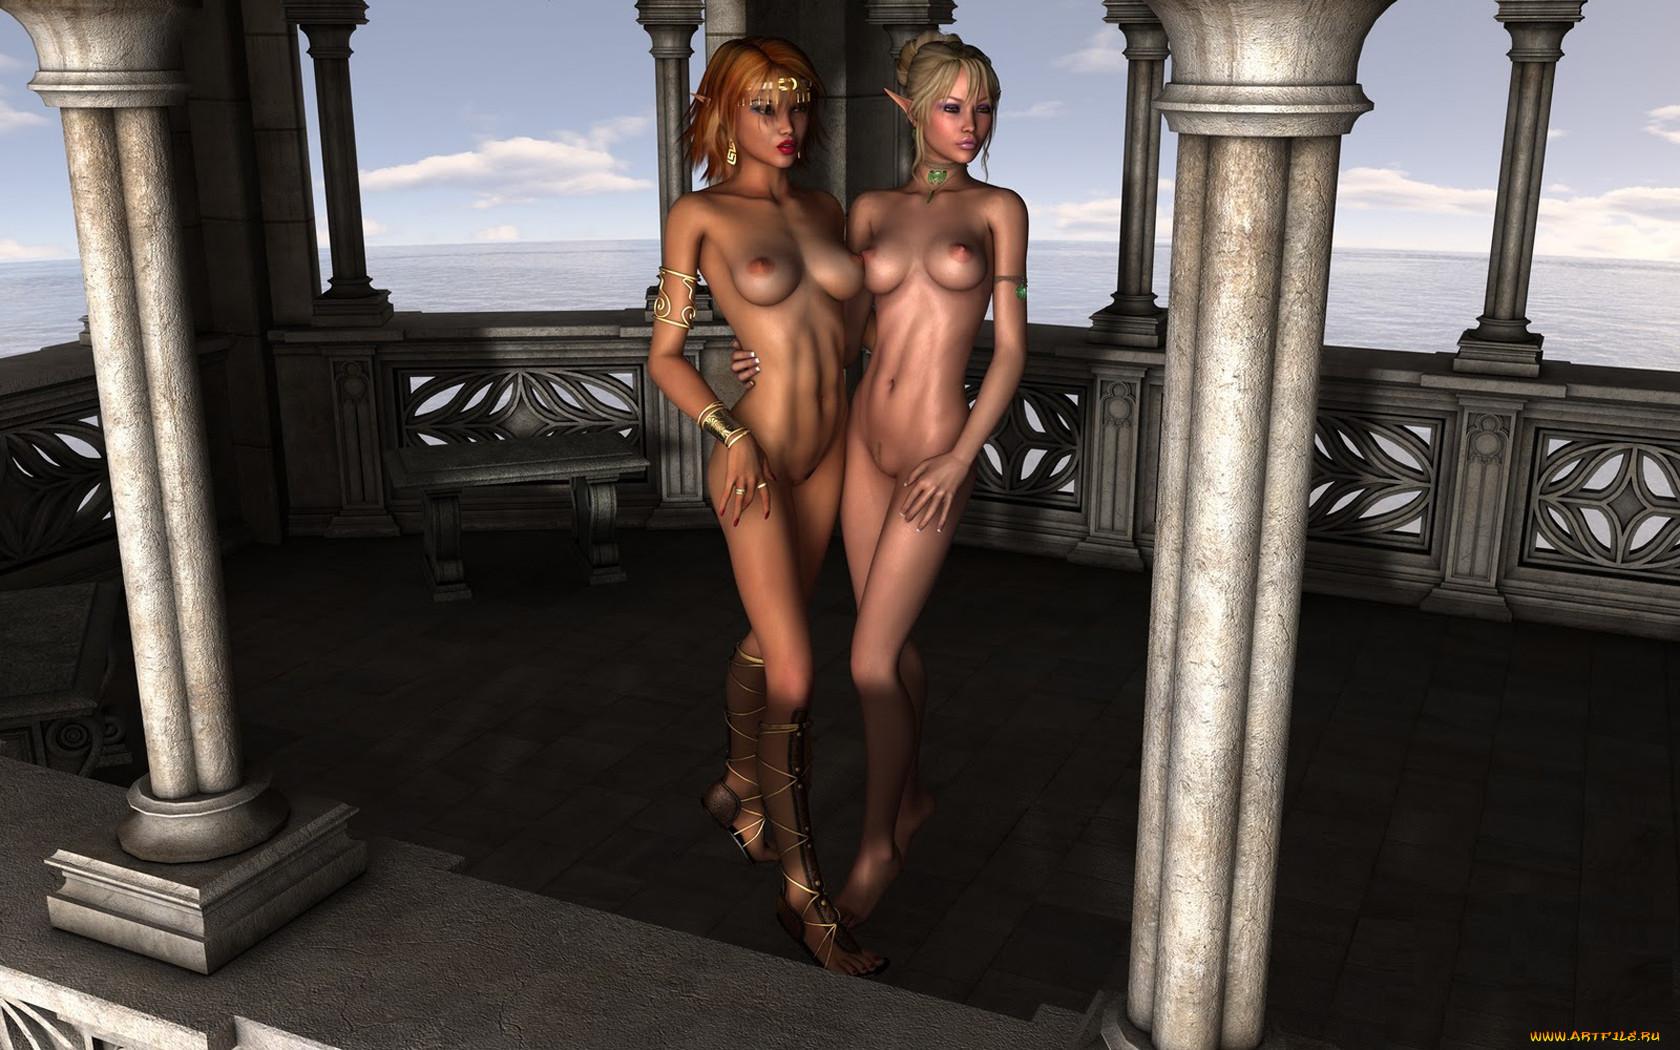 Erotic elves video fucked pic